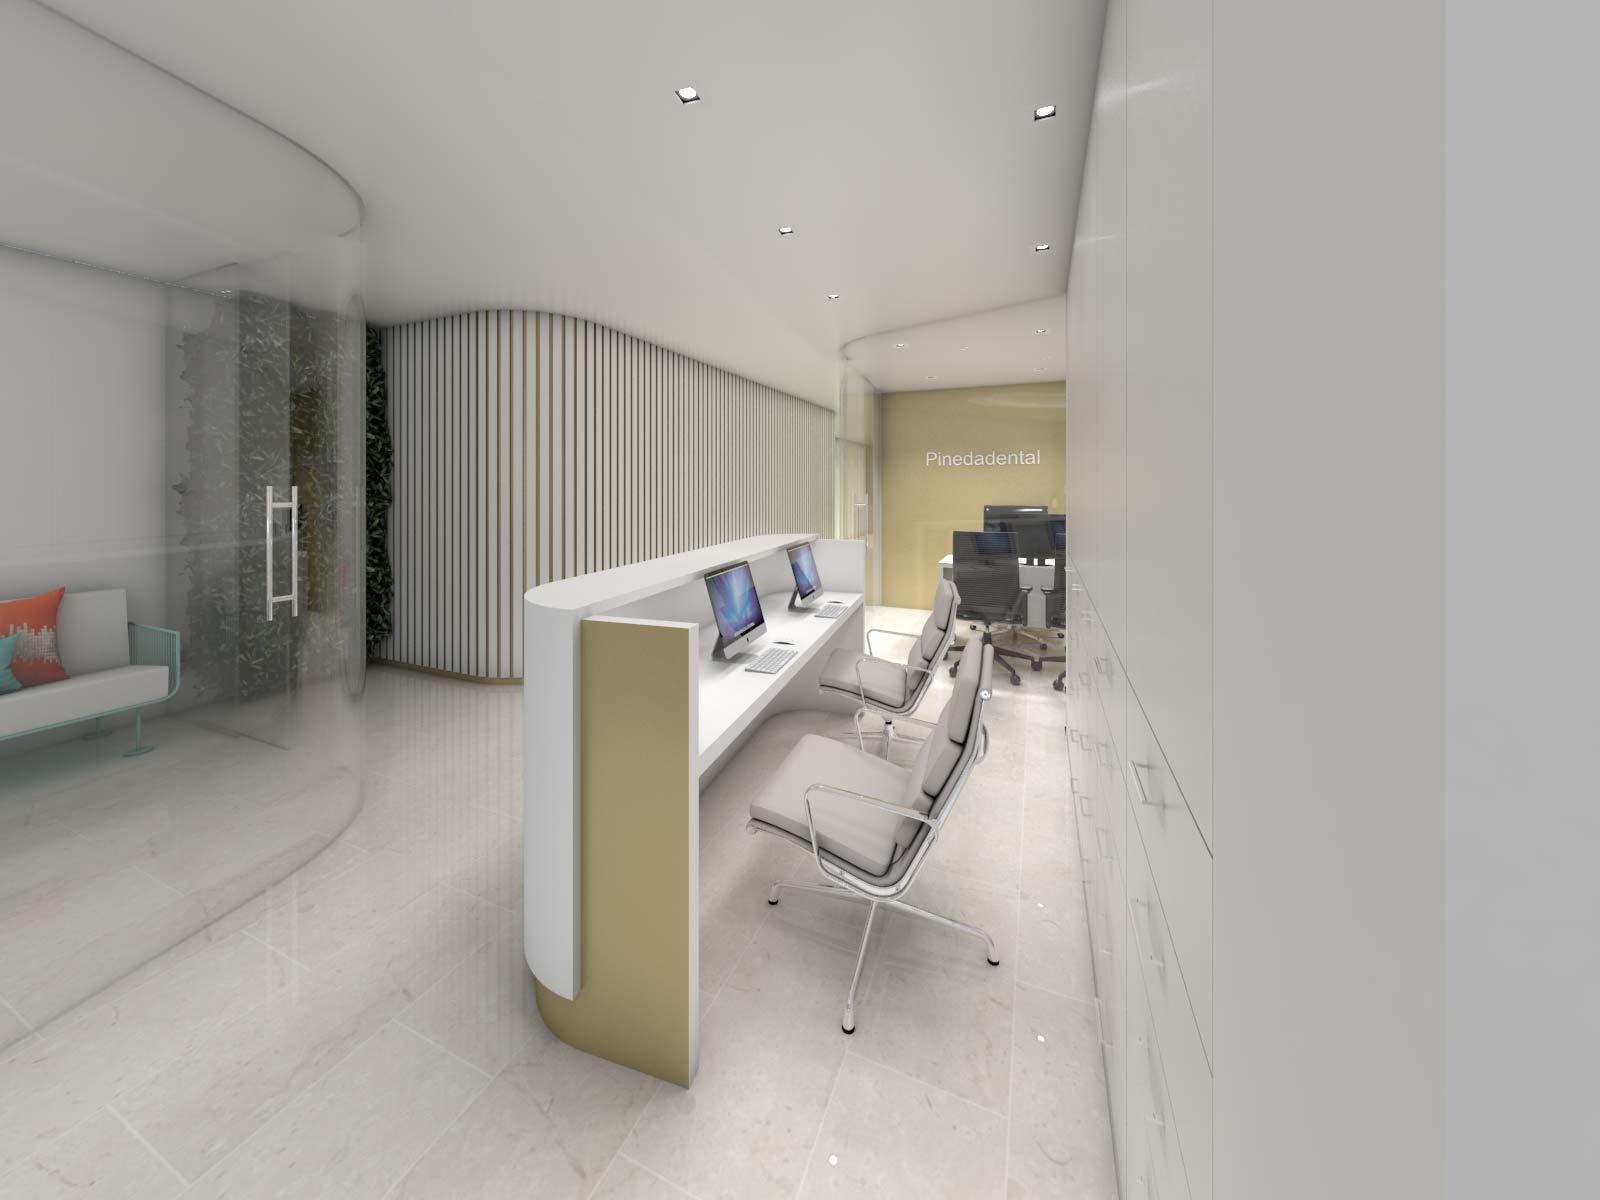 Reception Desk Pinedadental Clínica Dental Dentista - Rosa Colet Design